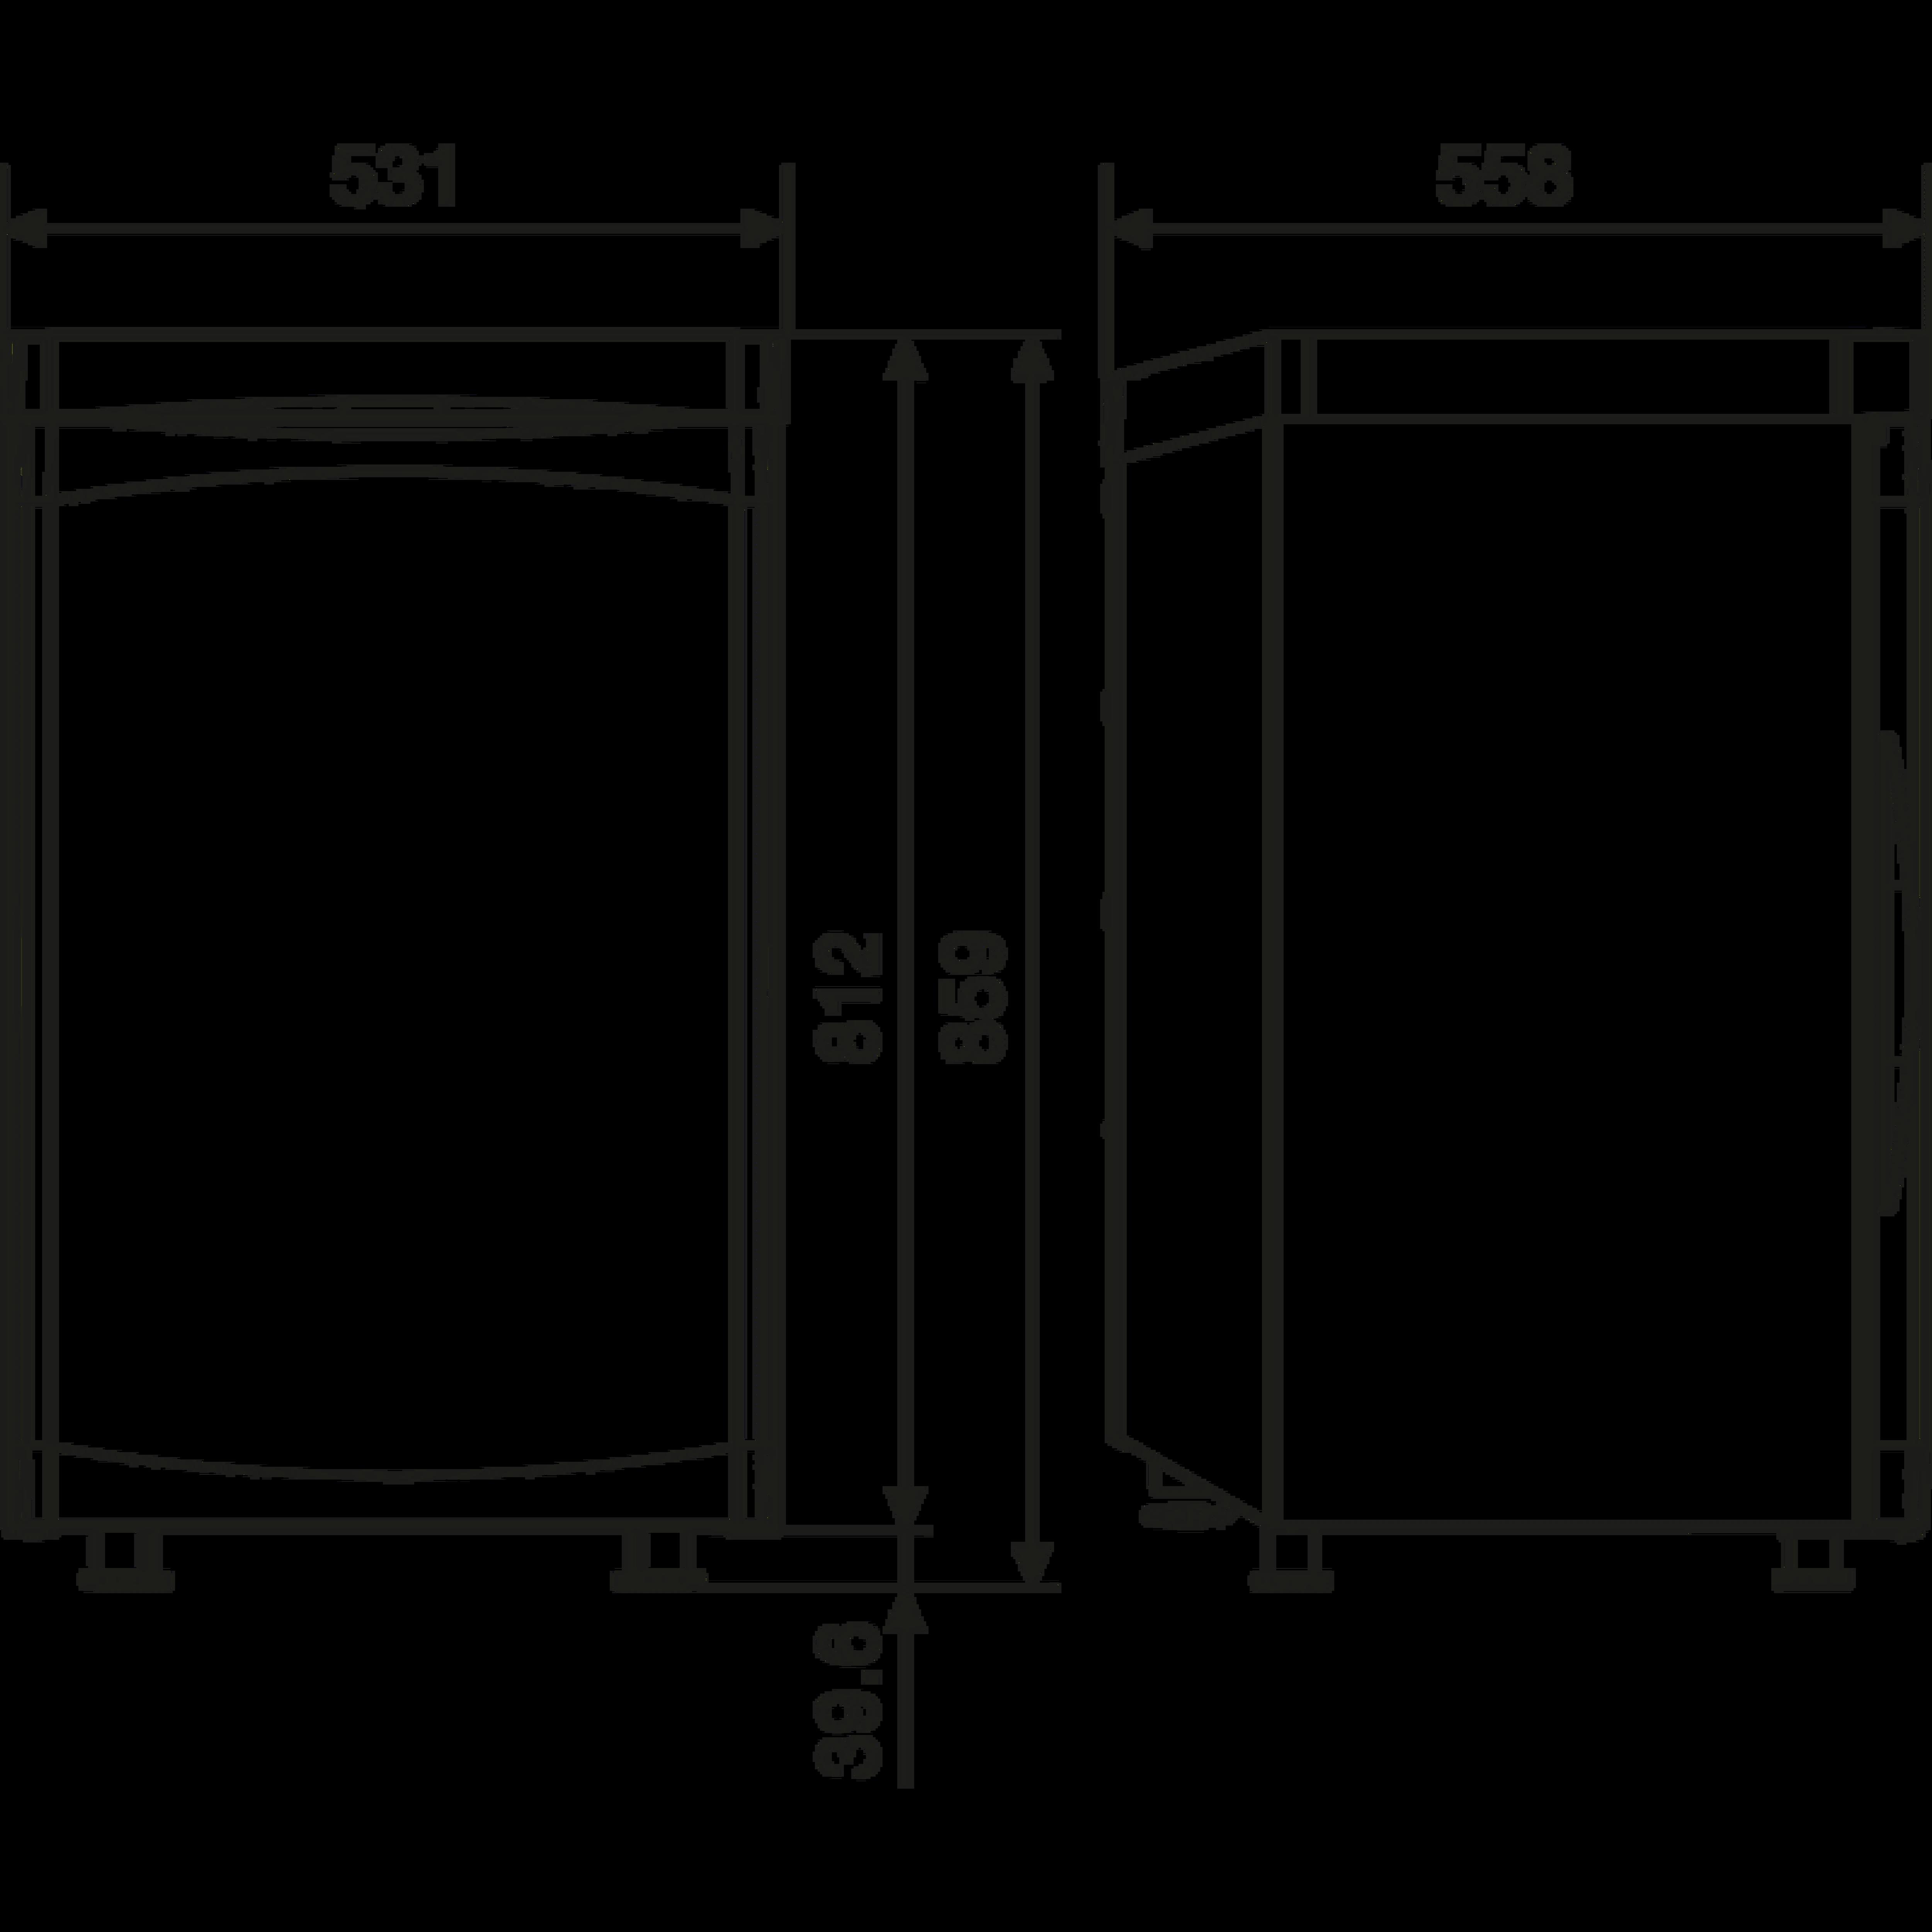 RGE 2100 Dimensions